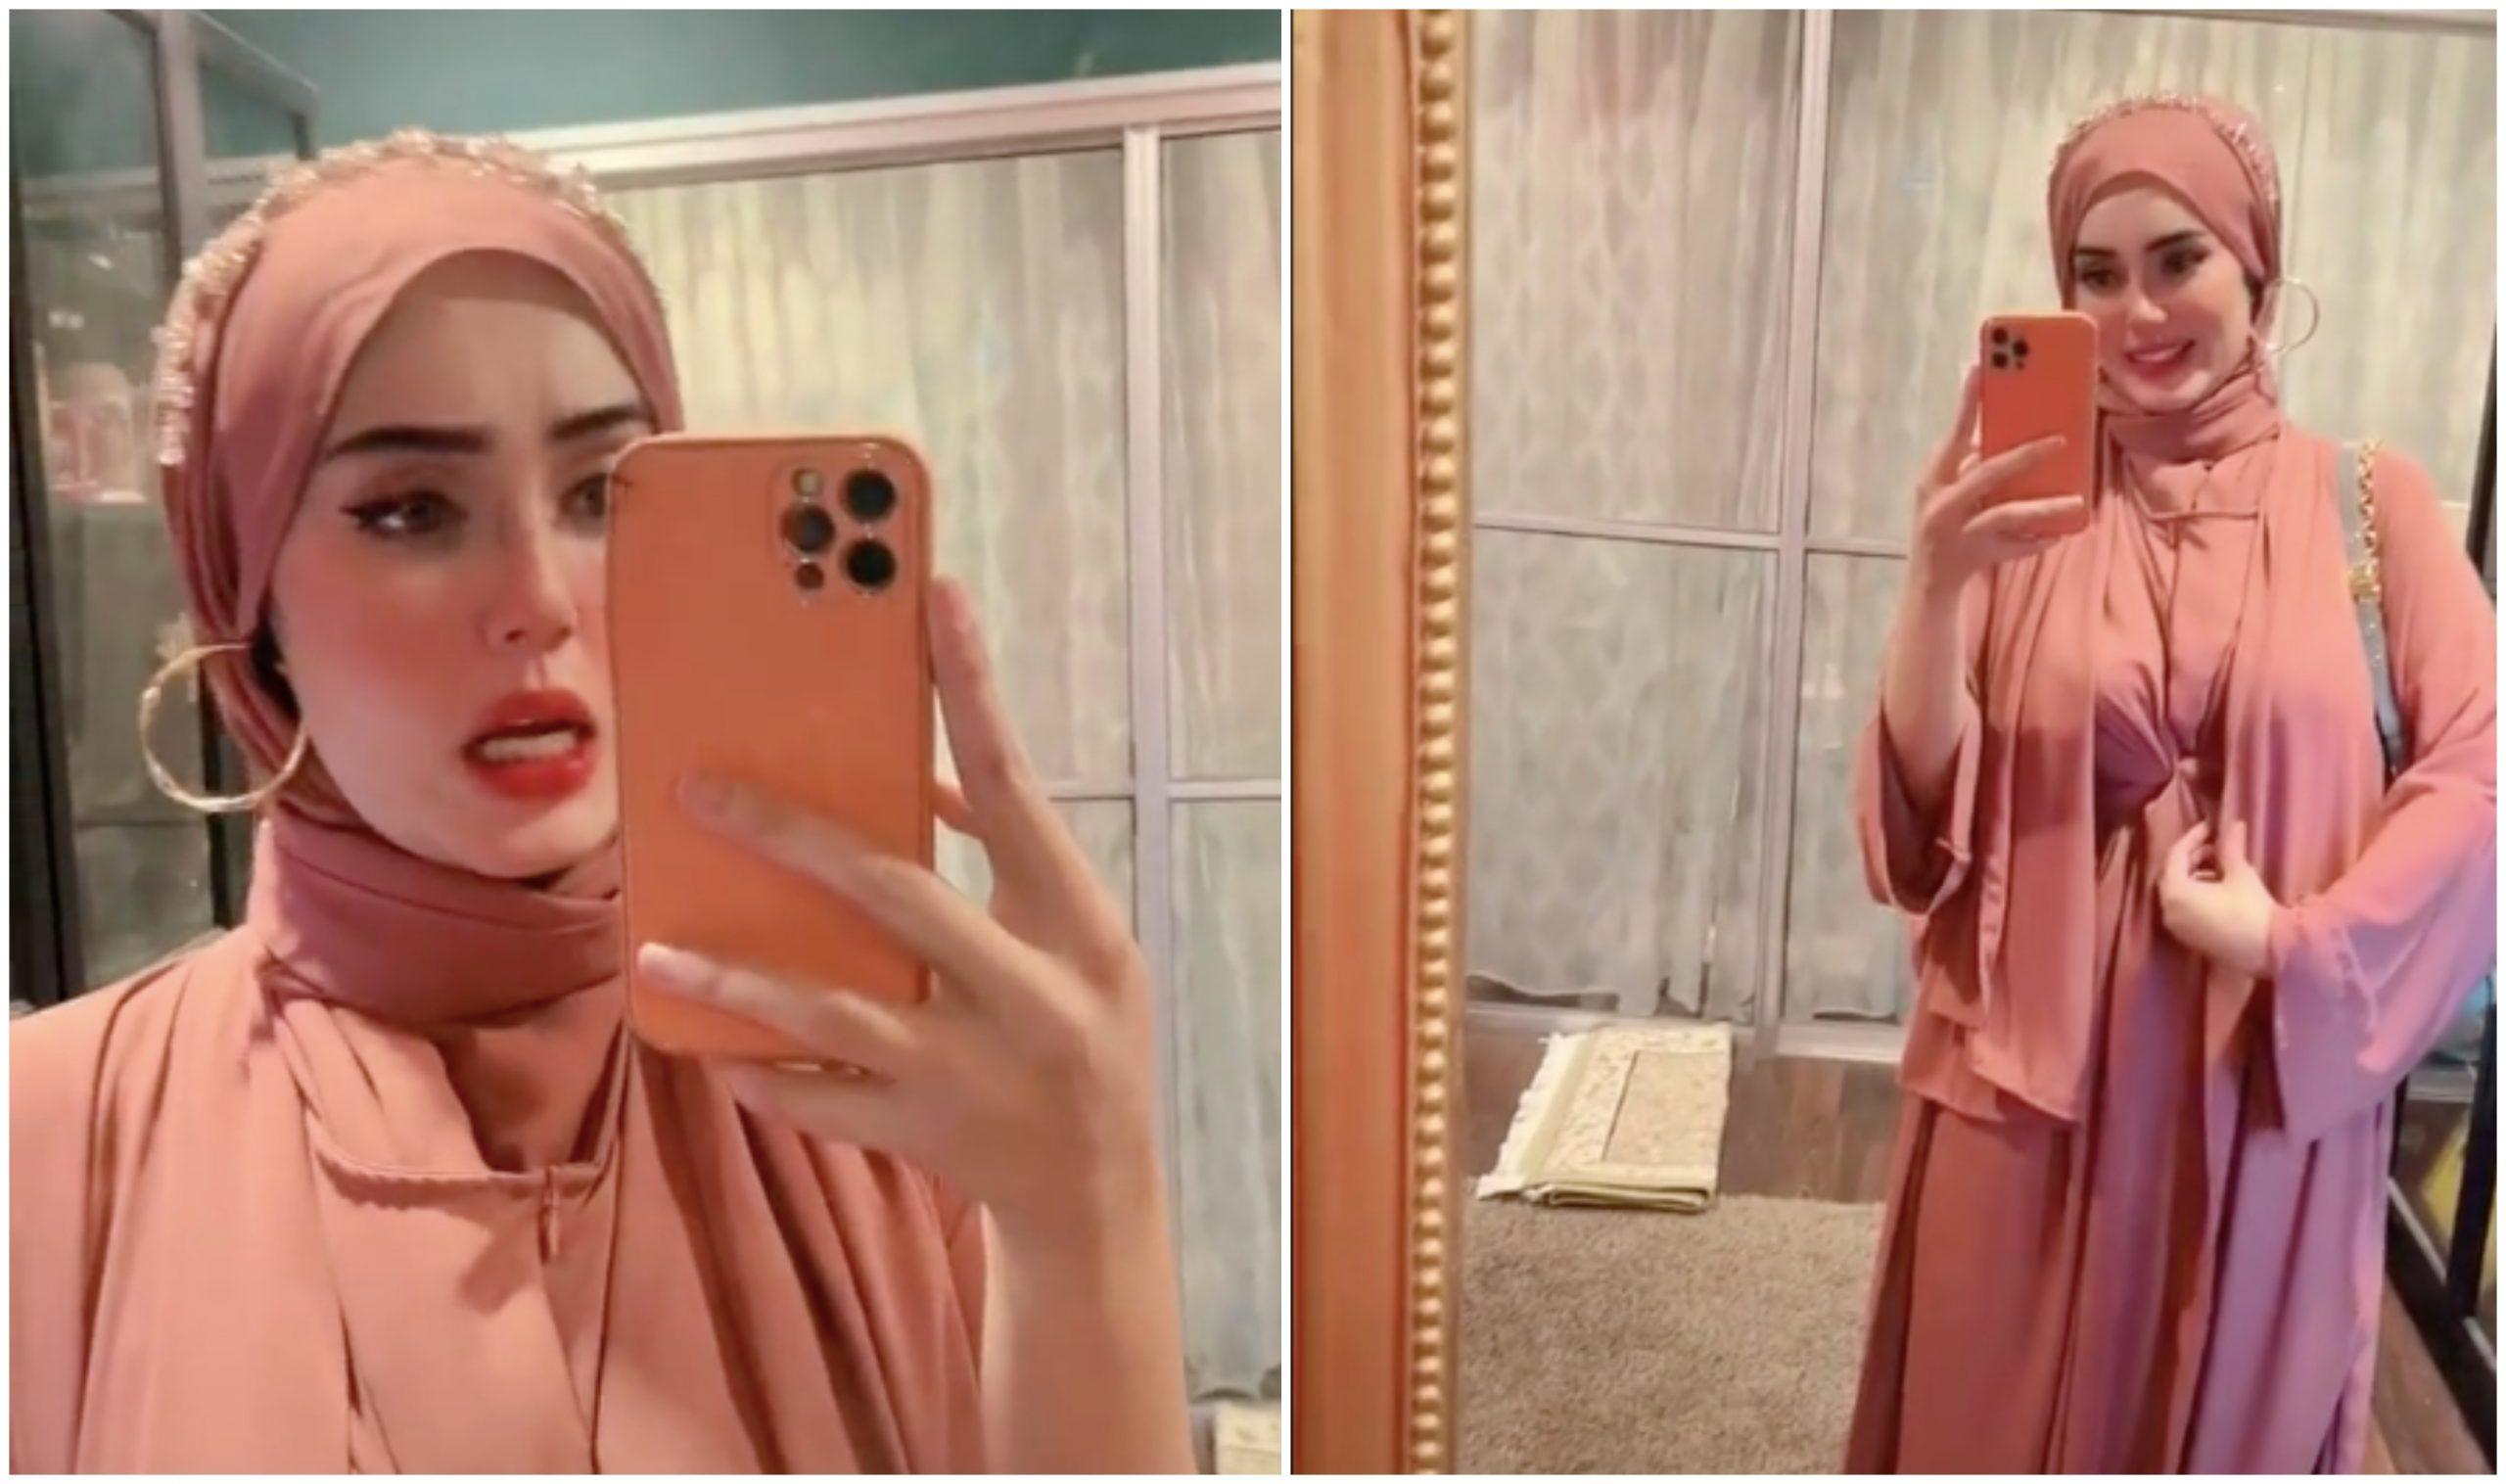 'Rasa Nak Pakai Tudung Balik, Tapi Nanti Kena Kecam' – Uqasha Senrose 3